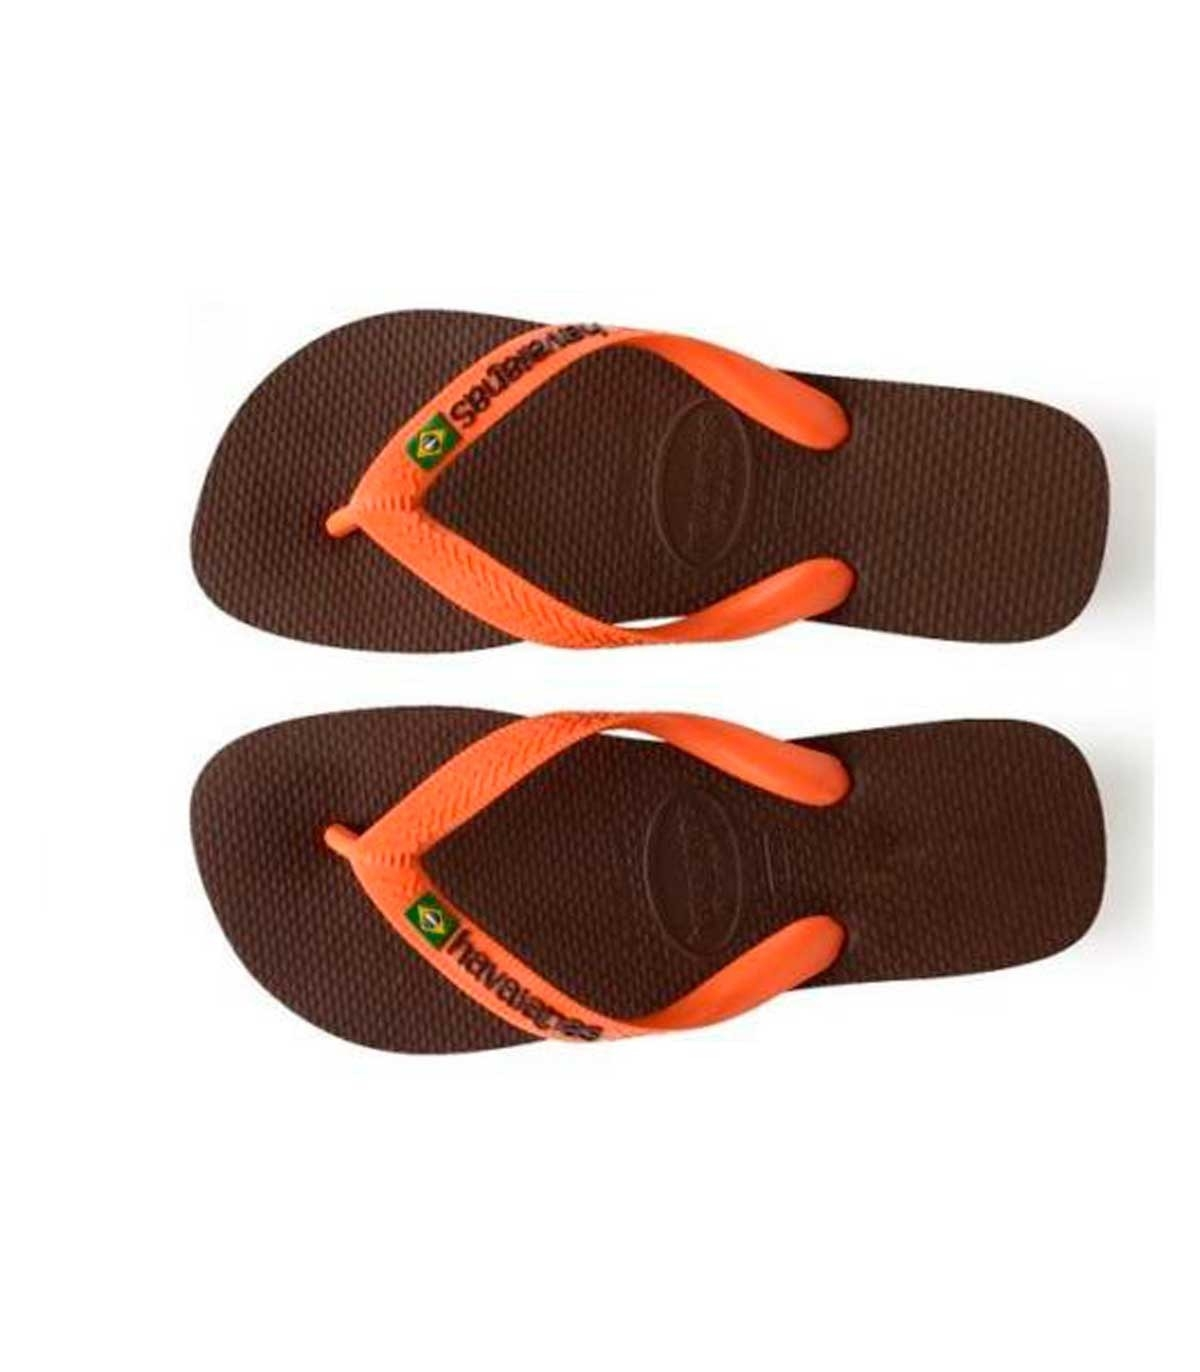 f0854fc561 Buy Havaianas dark brown Brazil flipflop